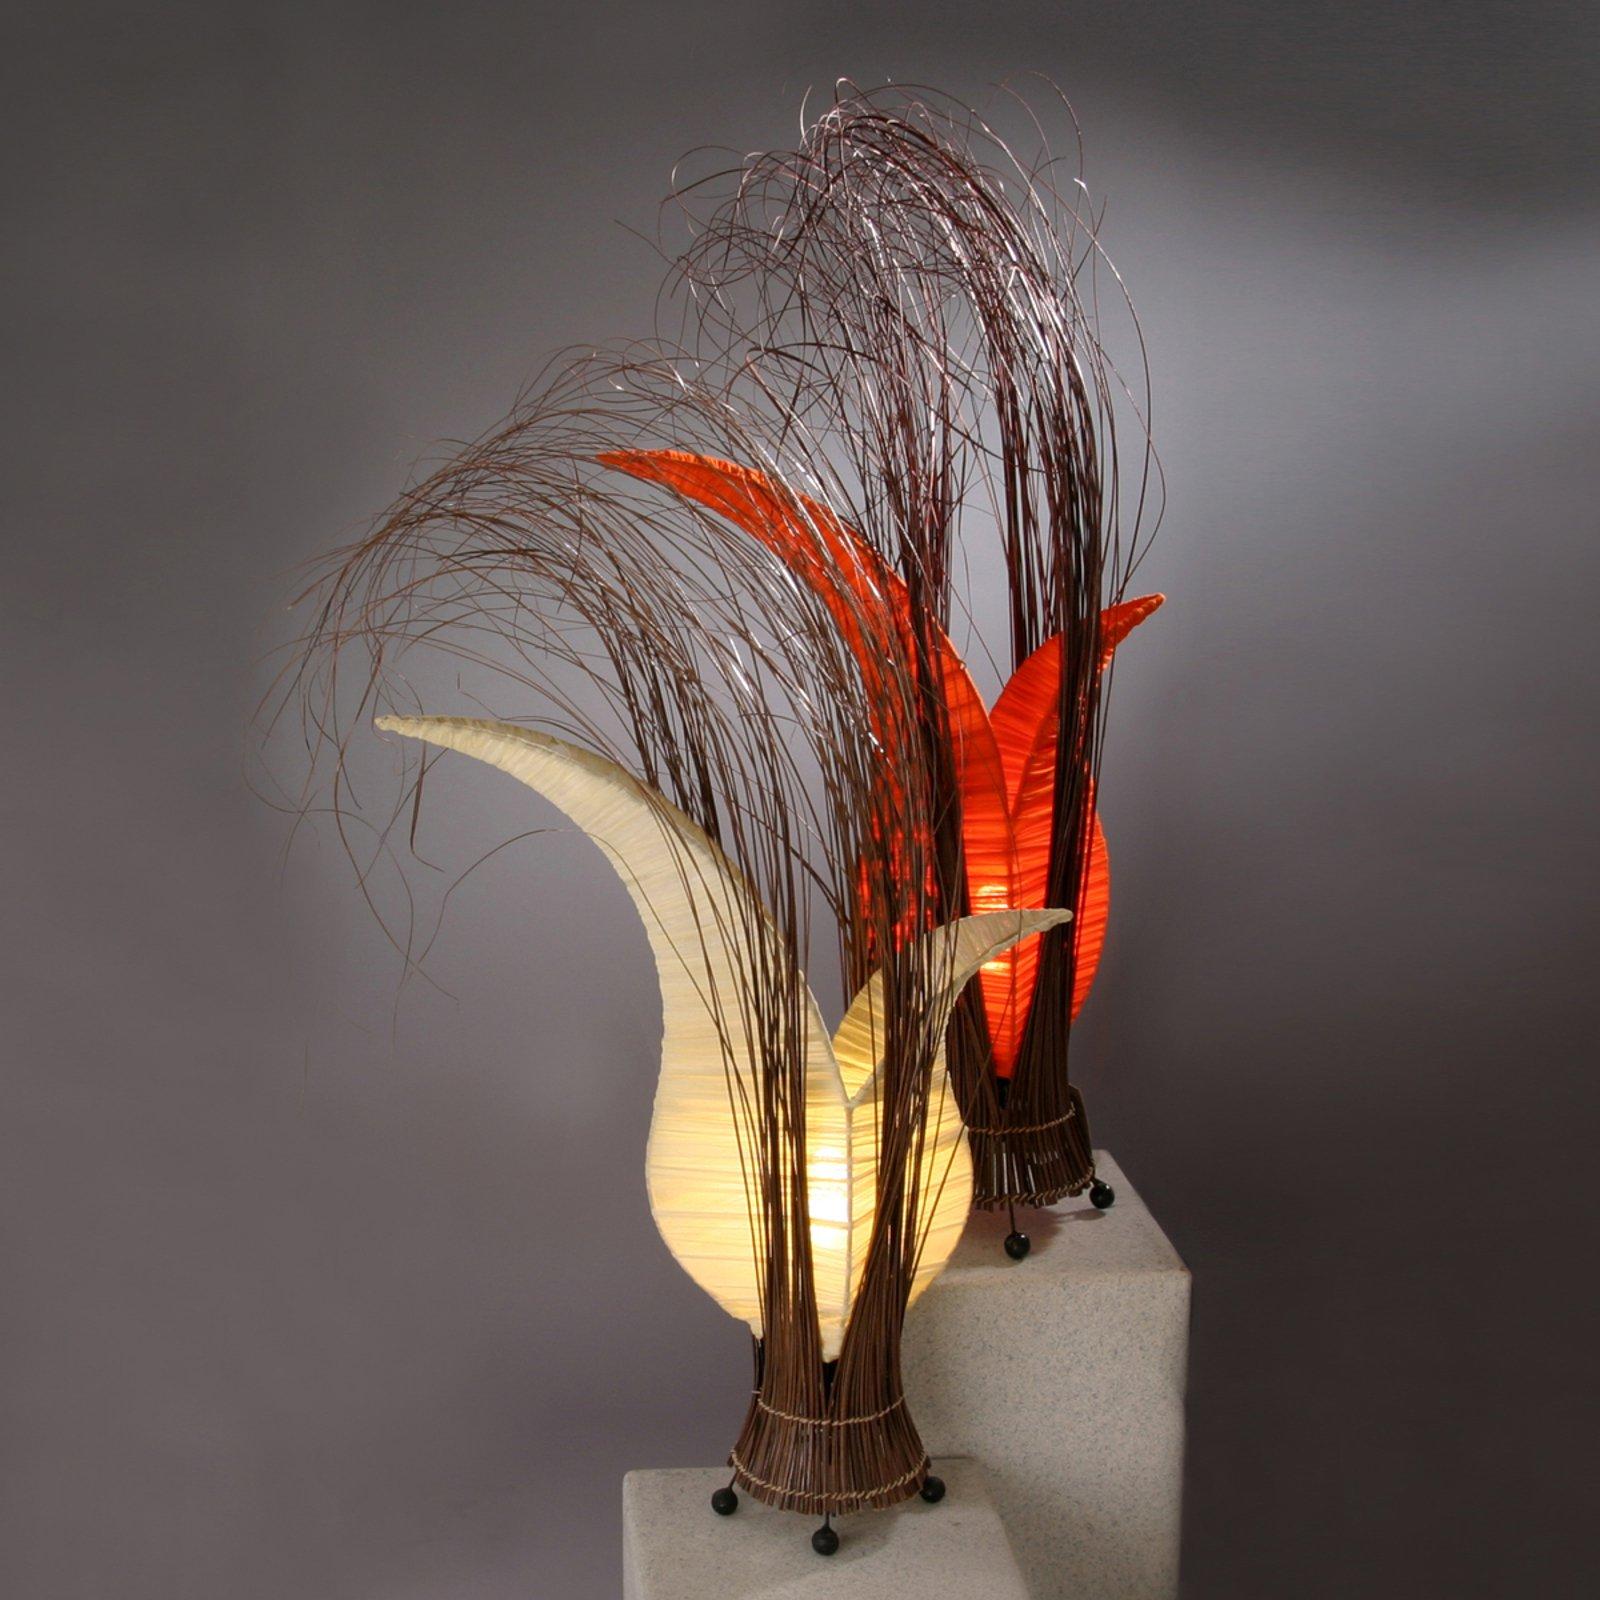 Bordlampe Bunga med blomsterform, oransje